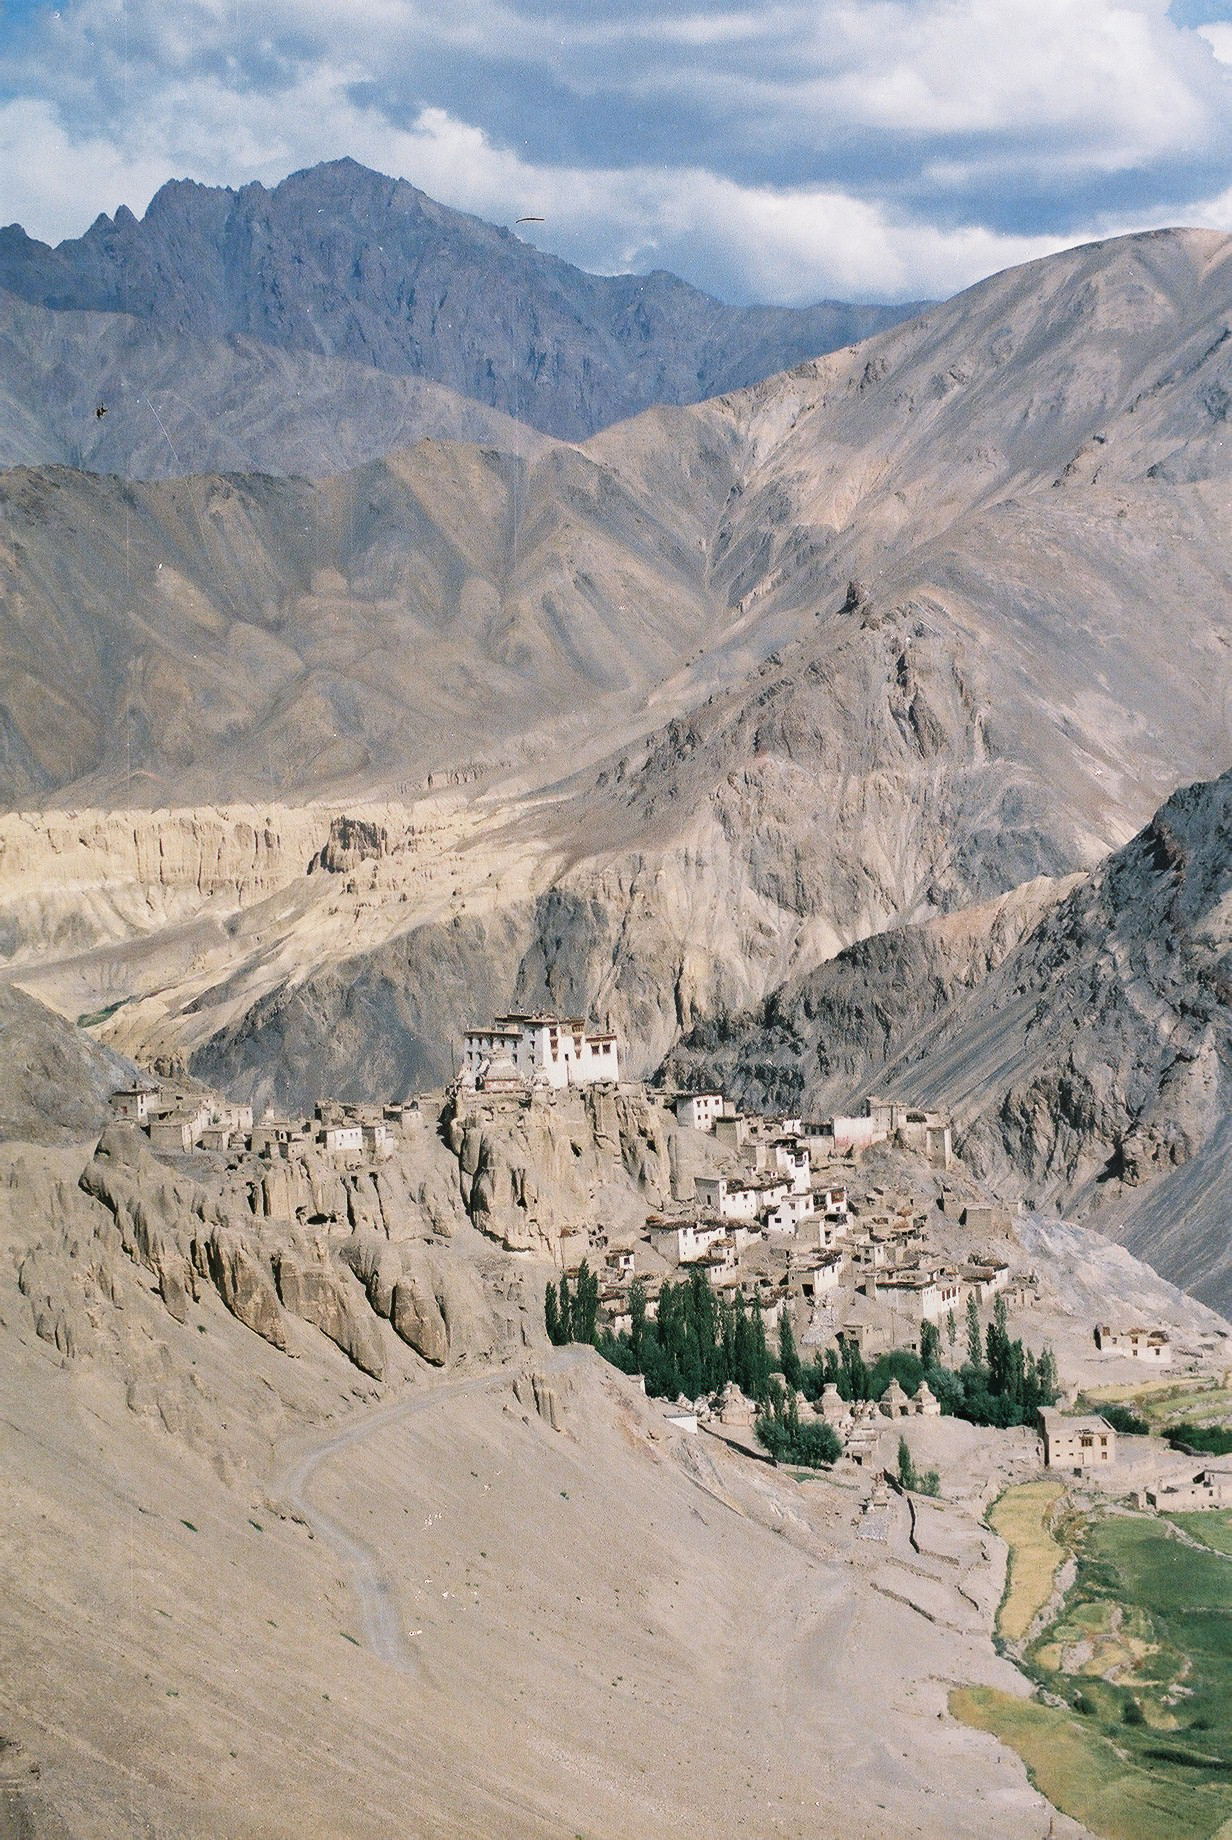 52. Lamayura gompa Road to Leh- Ladakh